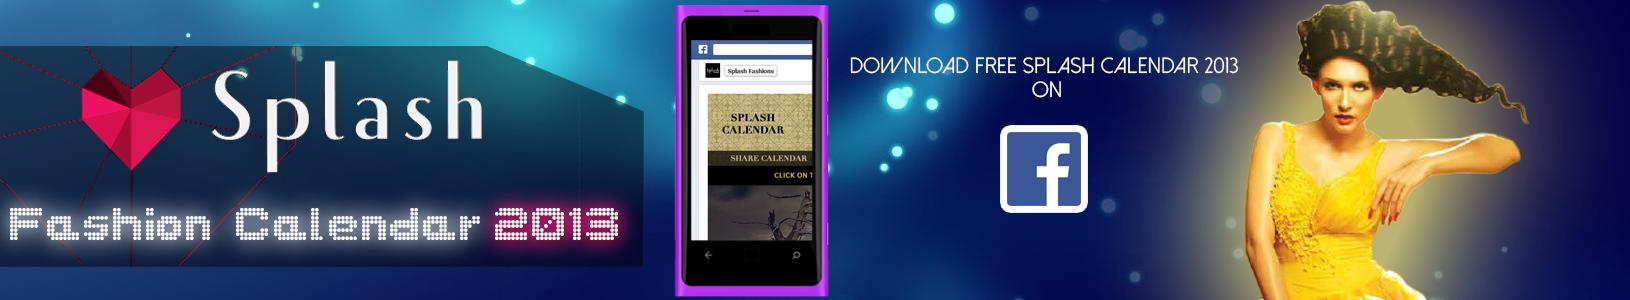 facebook-app-development-company-splash-calender-120x120